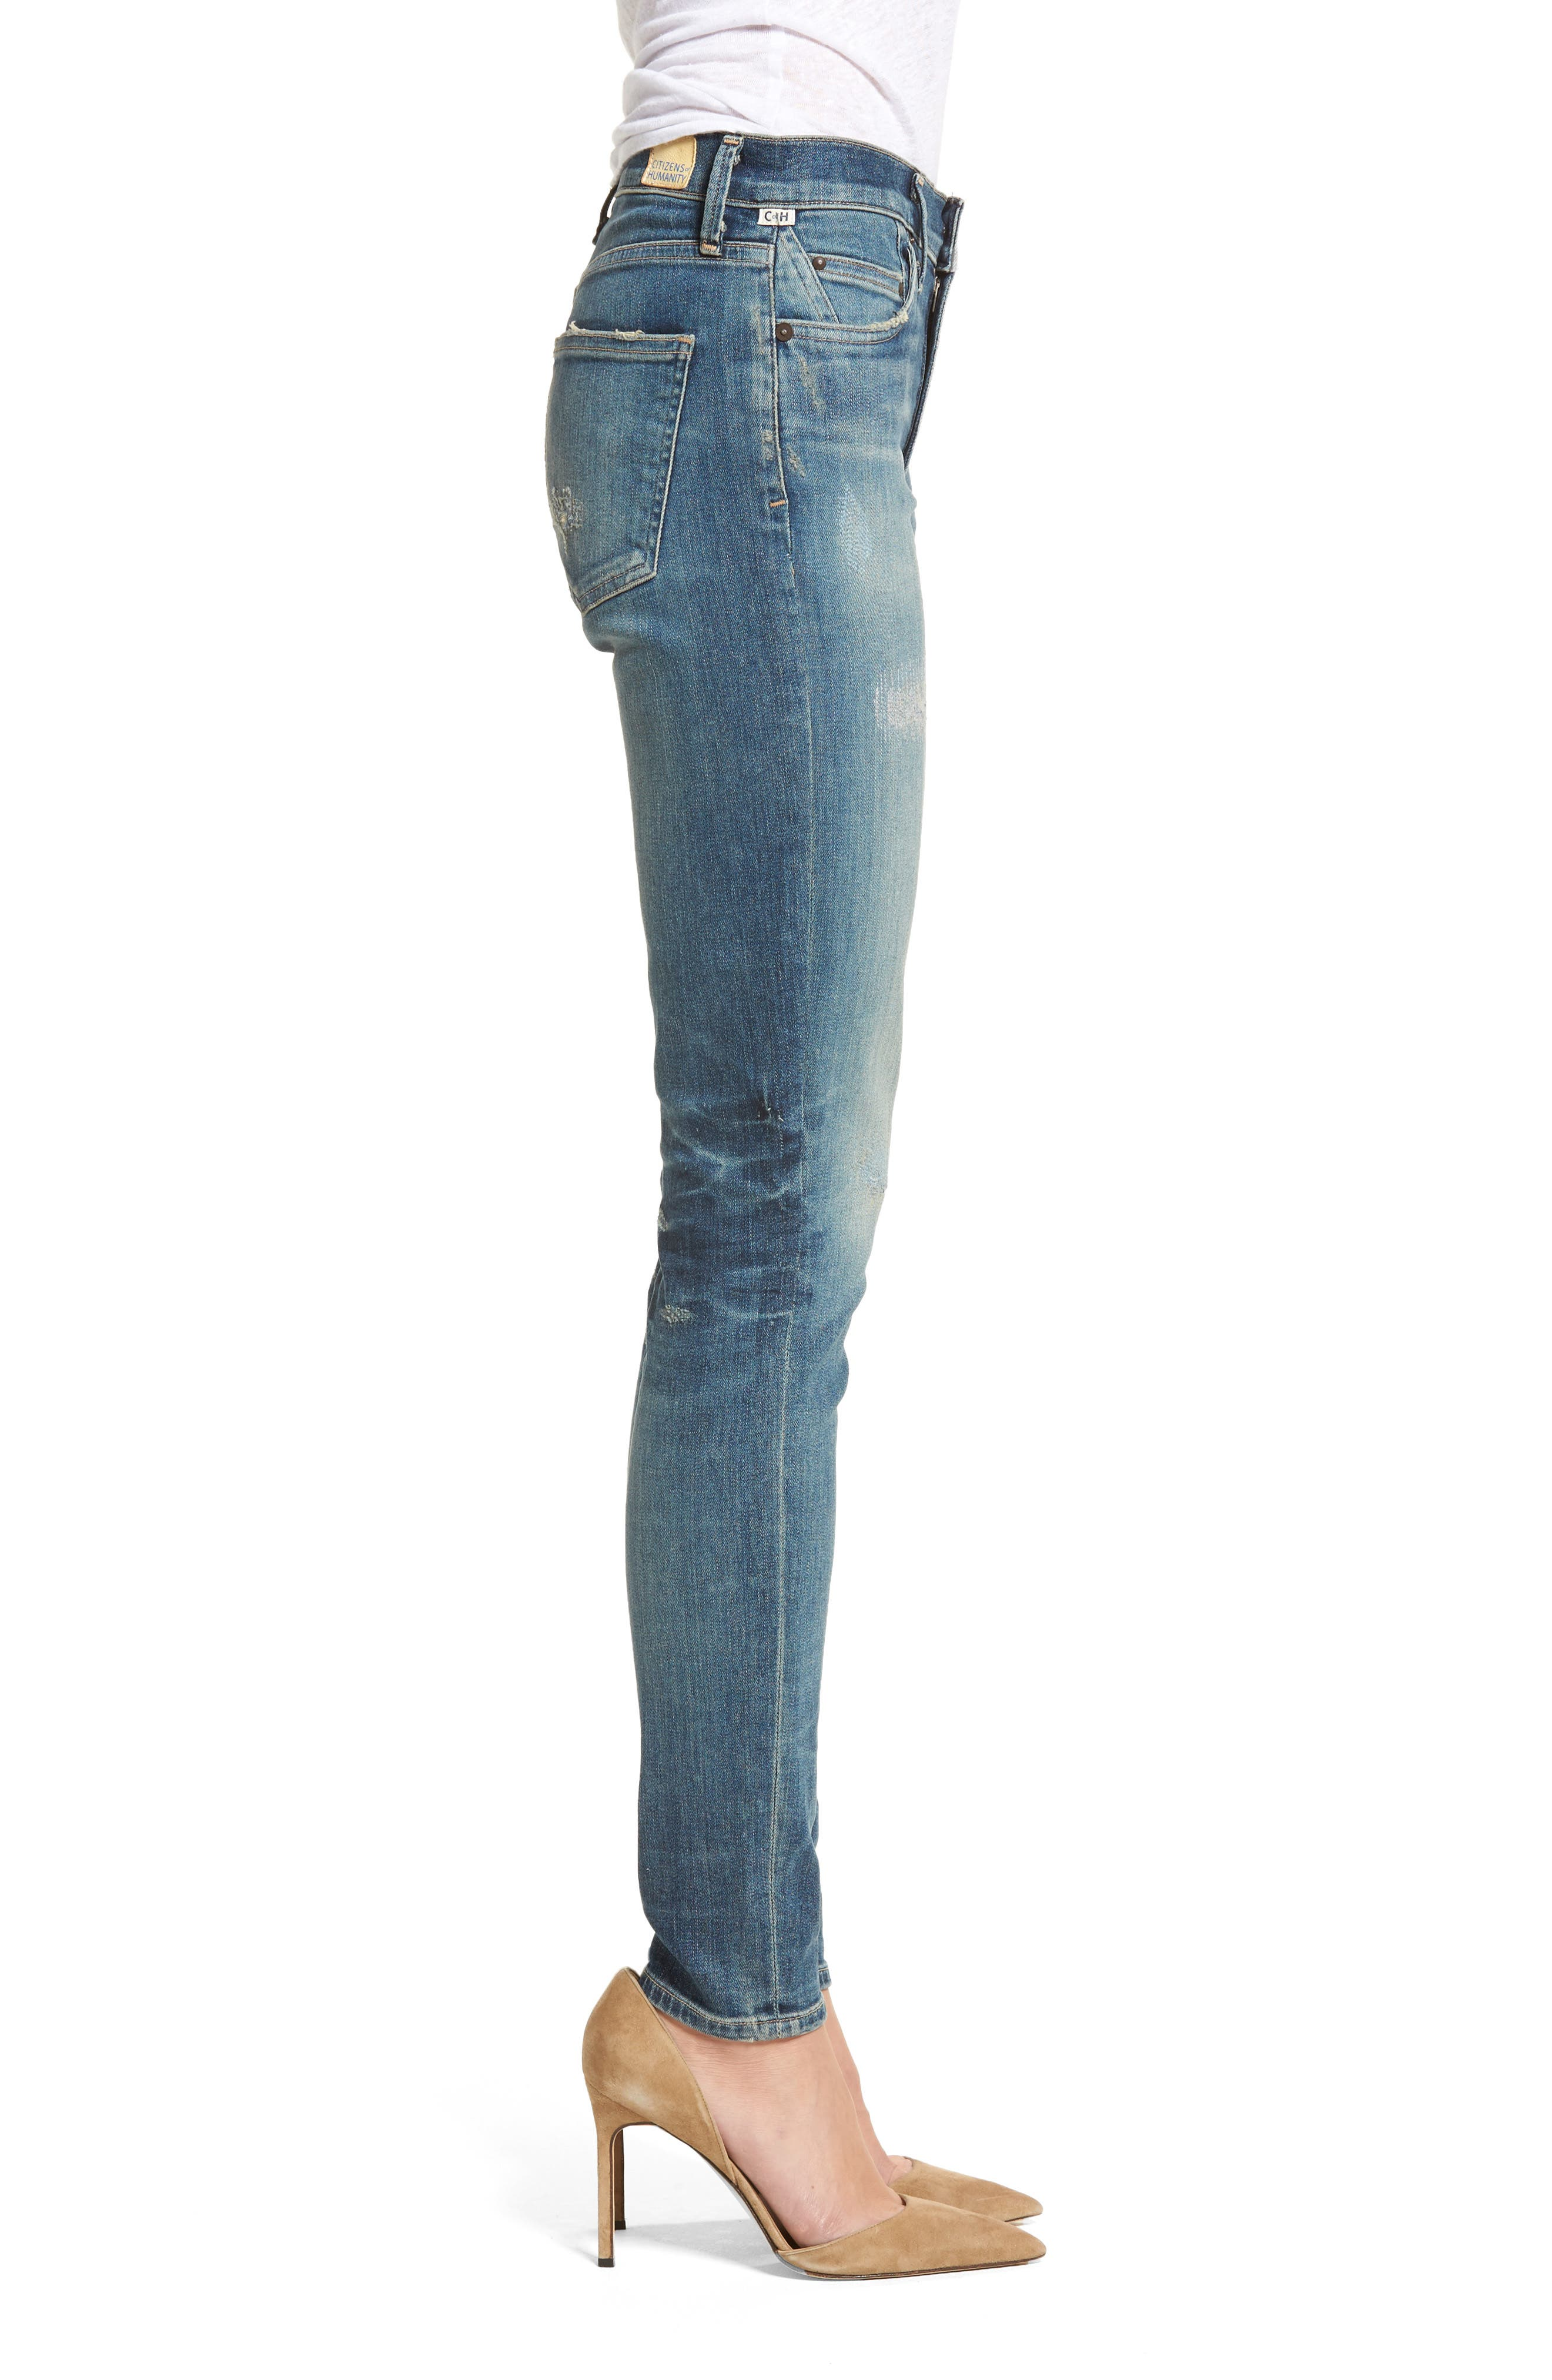 Rocket High Waist Skinny Jeans,                             Alternate thumbnail 3, color,                             465